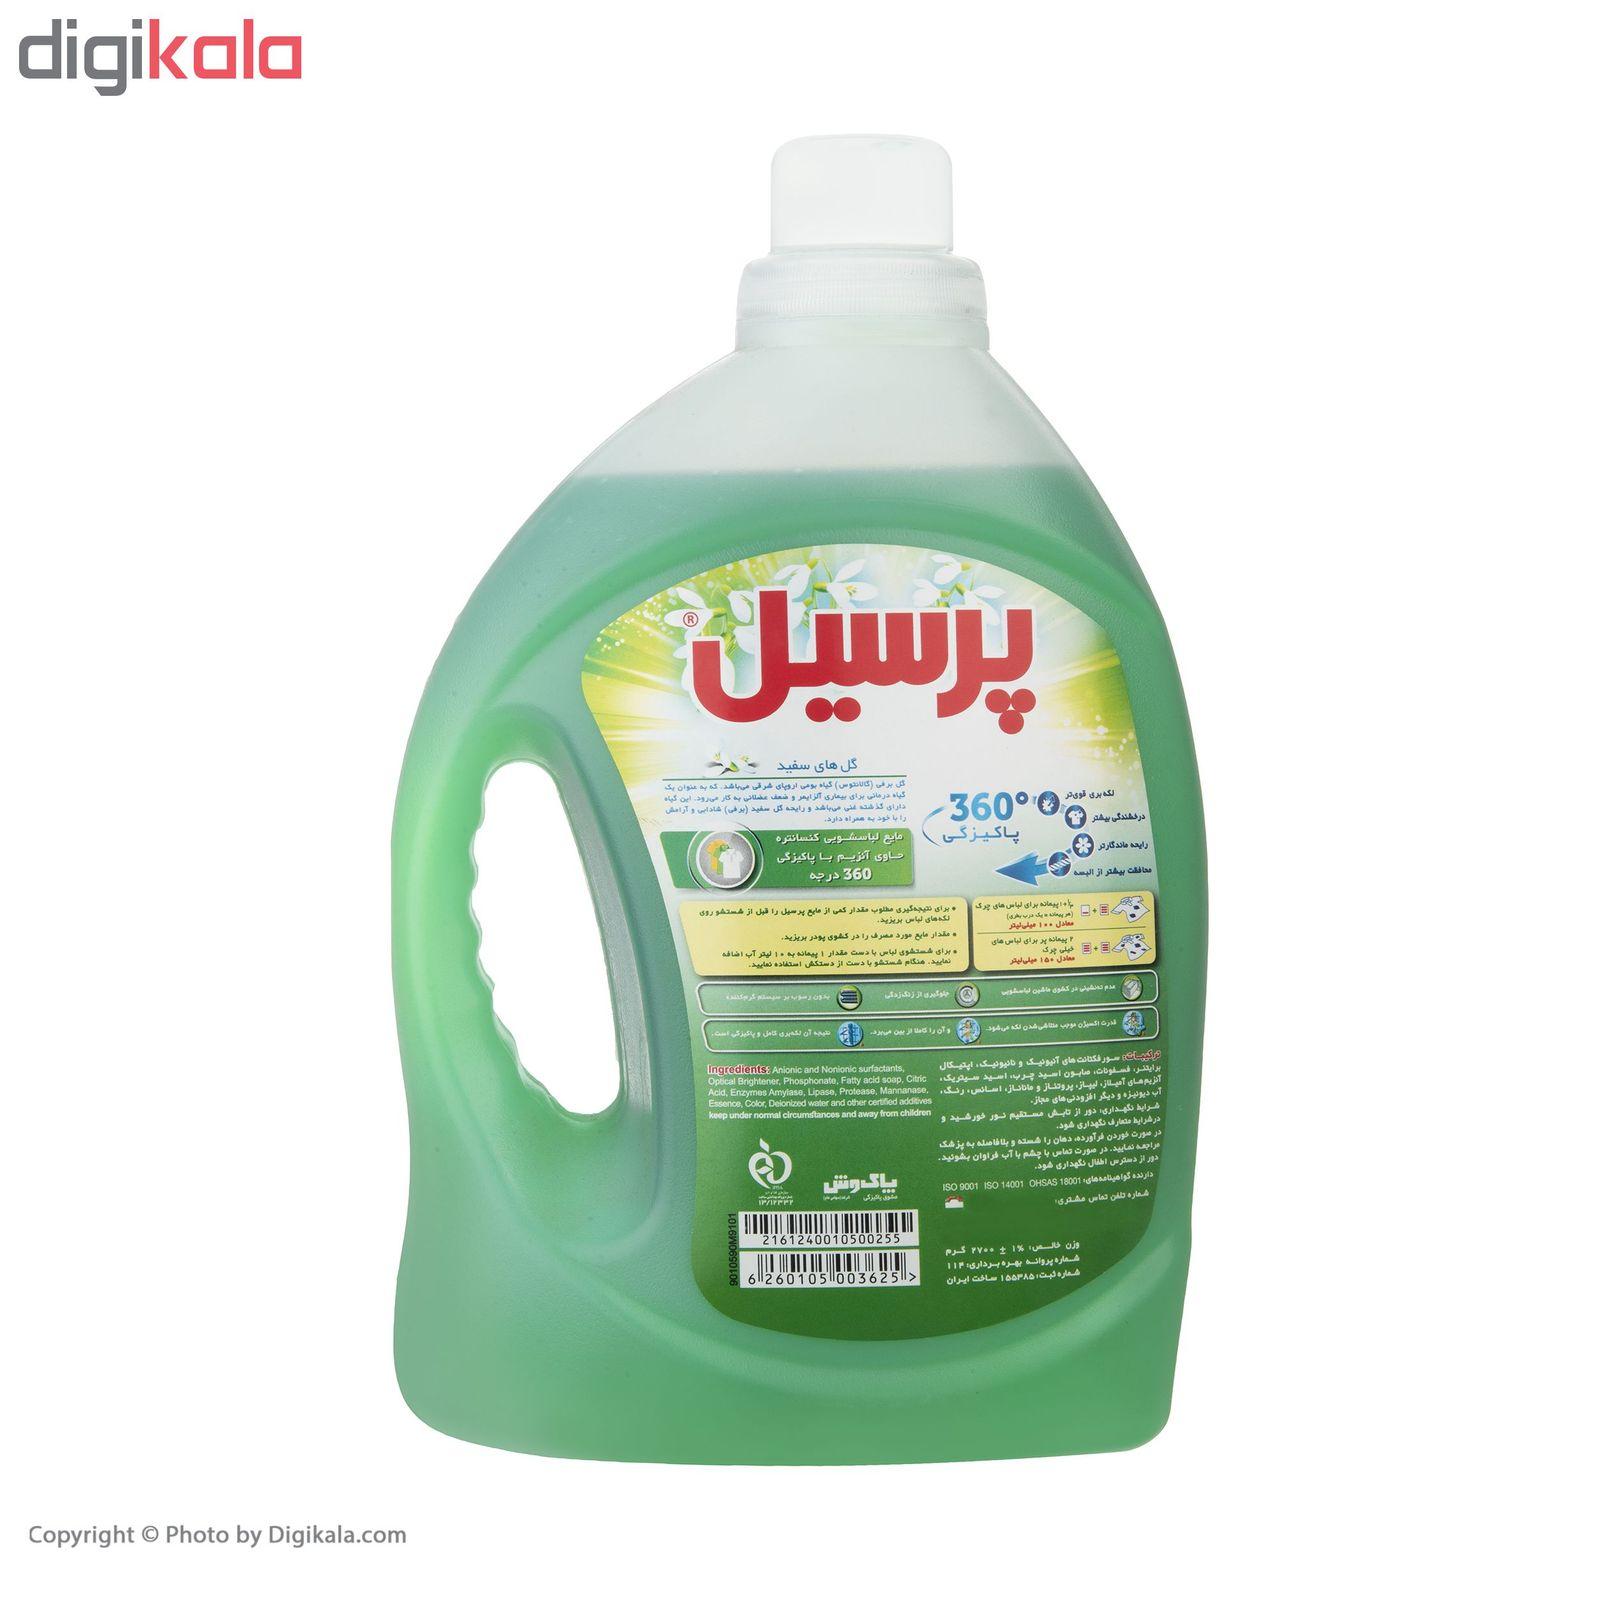 مایع ماشین لباسشویی پرسیل مدل 360Degree Cleanliness مقدار 2.7 کیلوگرم main 1 4